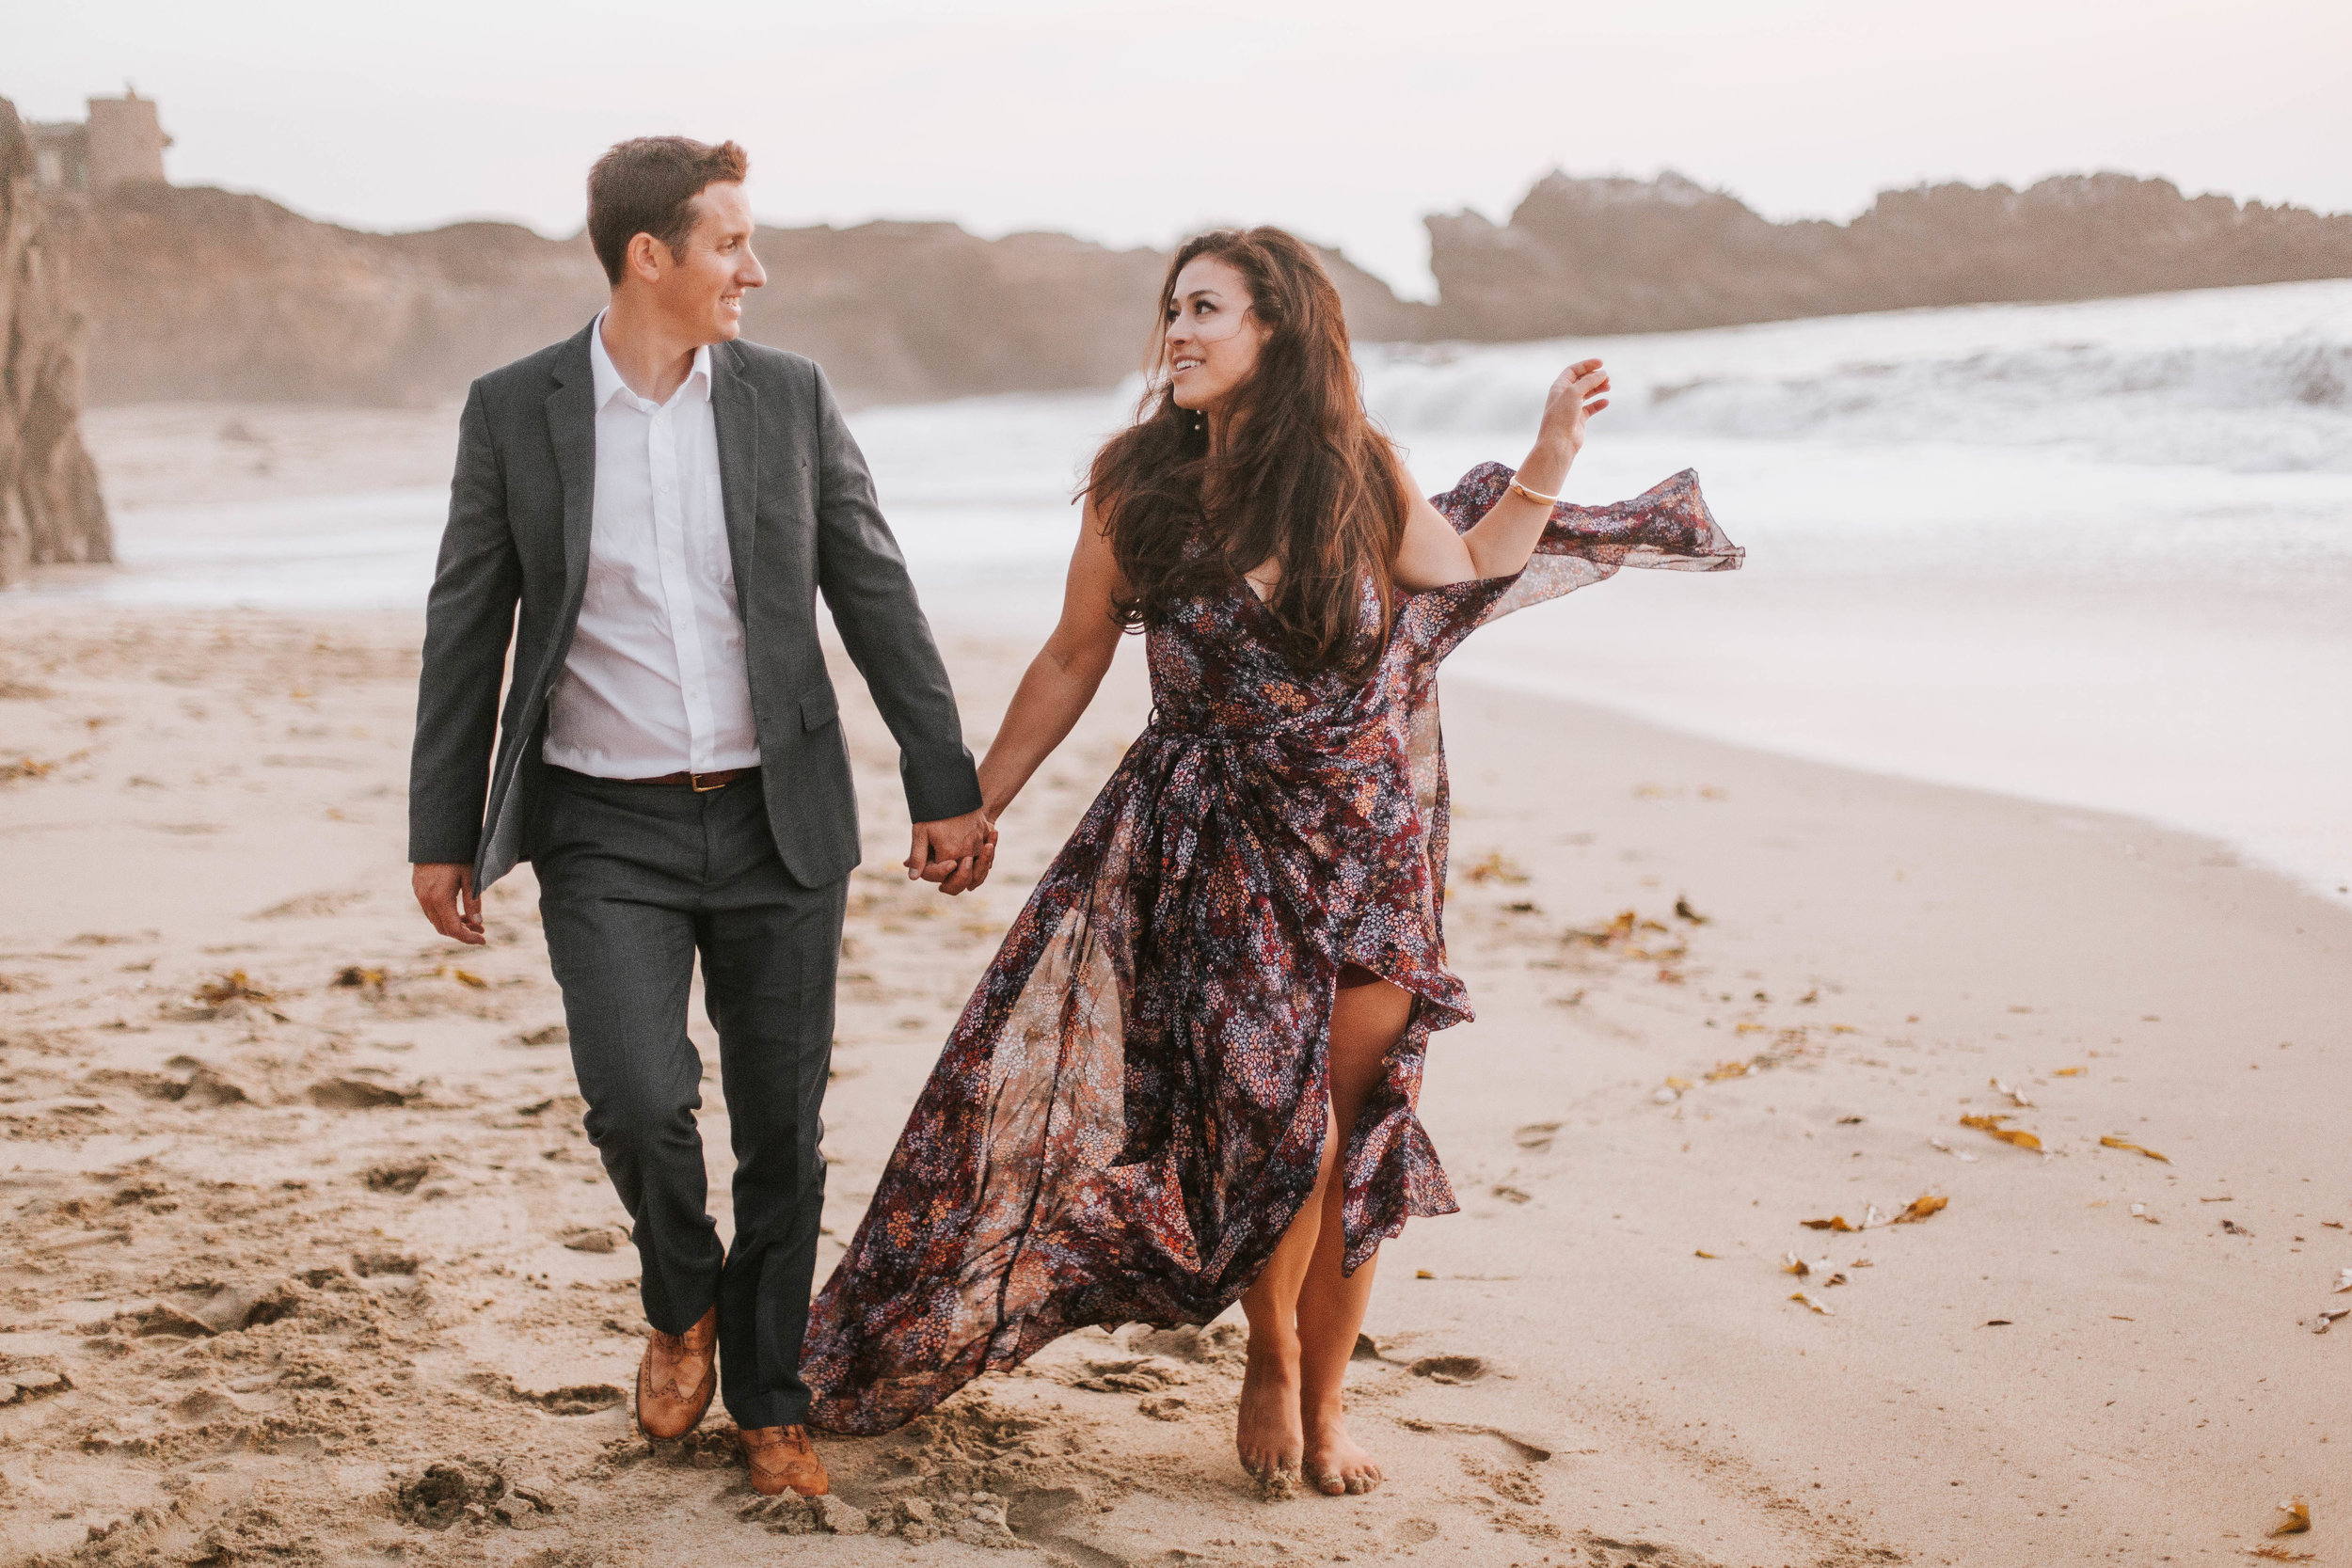 nicole-daacke-photography-big-sur-california-coast-adventure-engagement-photos-adventurous-elopement-intimate-wedding-photographer-golden-coastal-cali-engagement-session-3.jpg